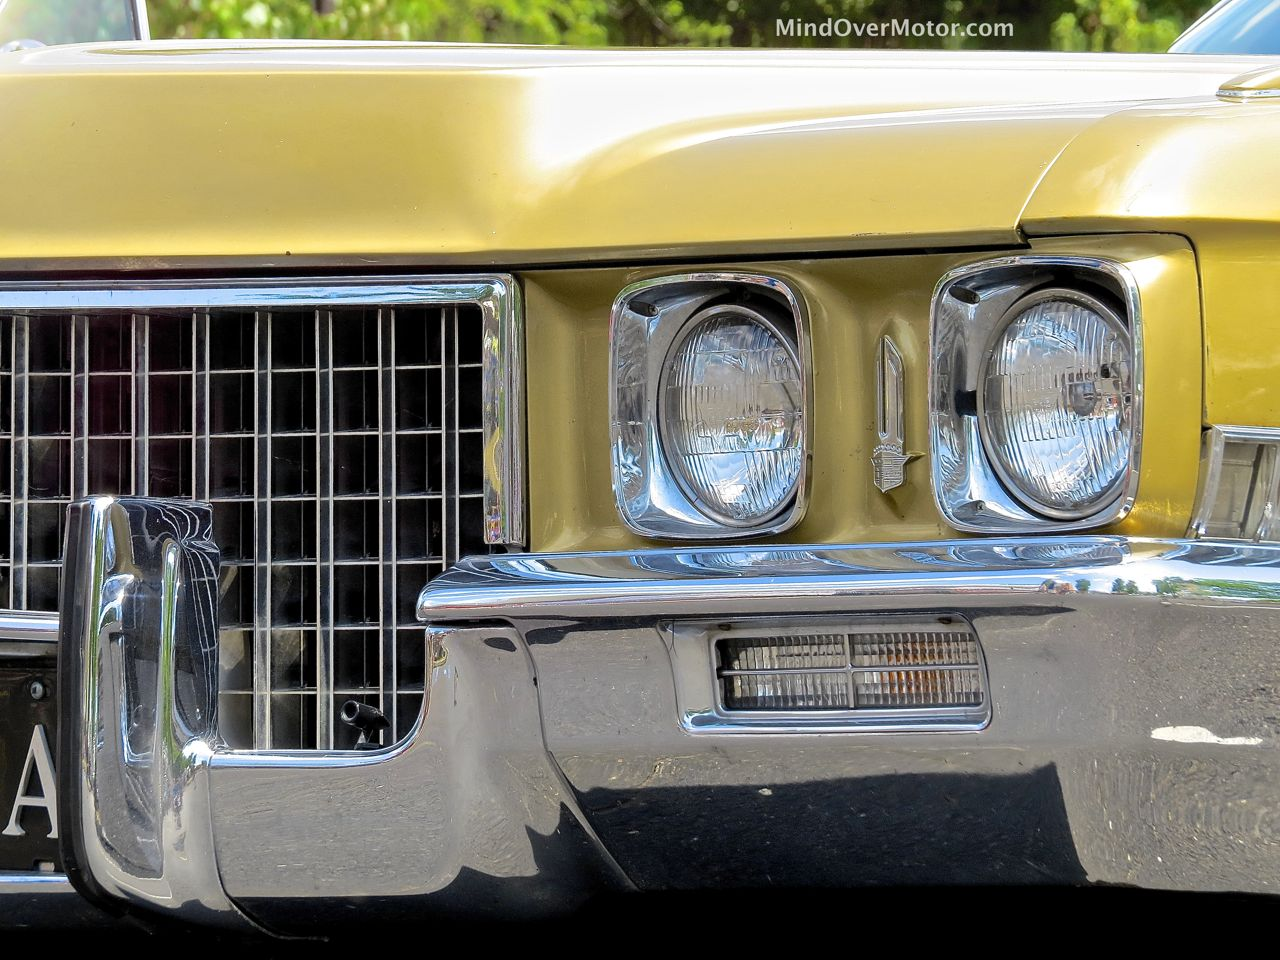 1971 Cadillac Sedan DeVille Headlights